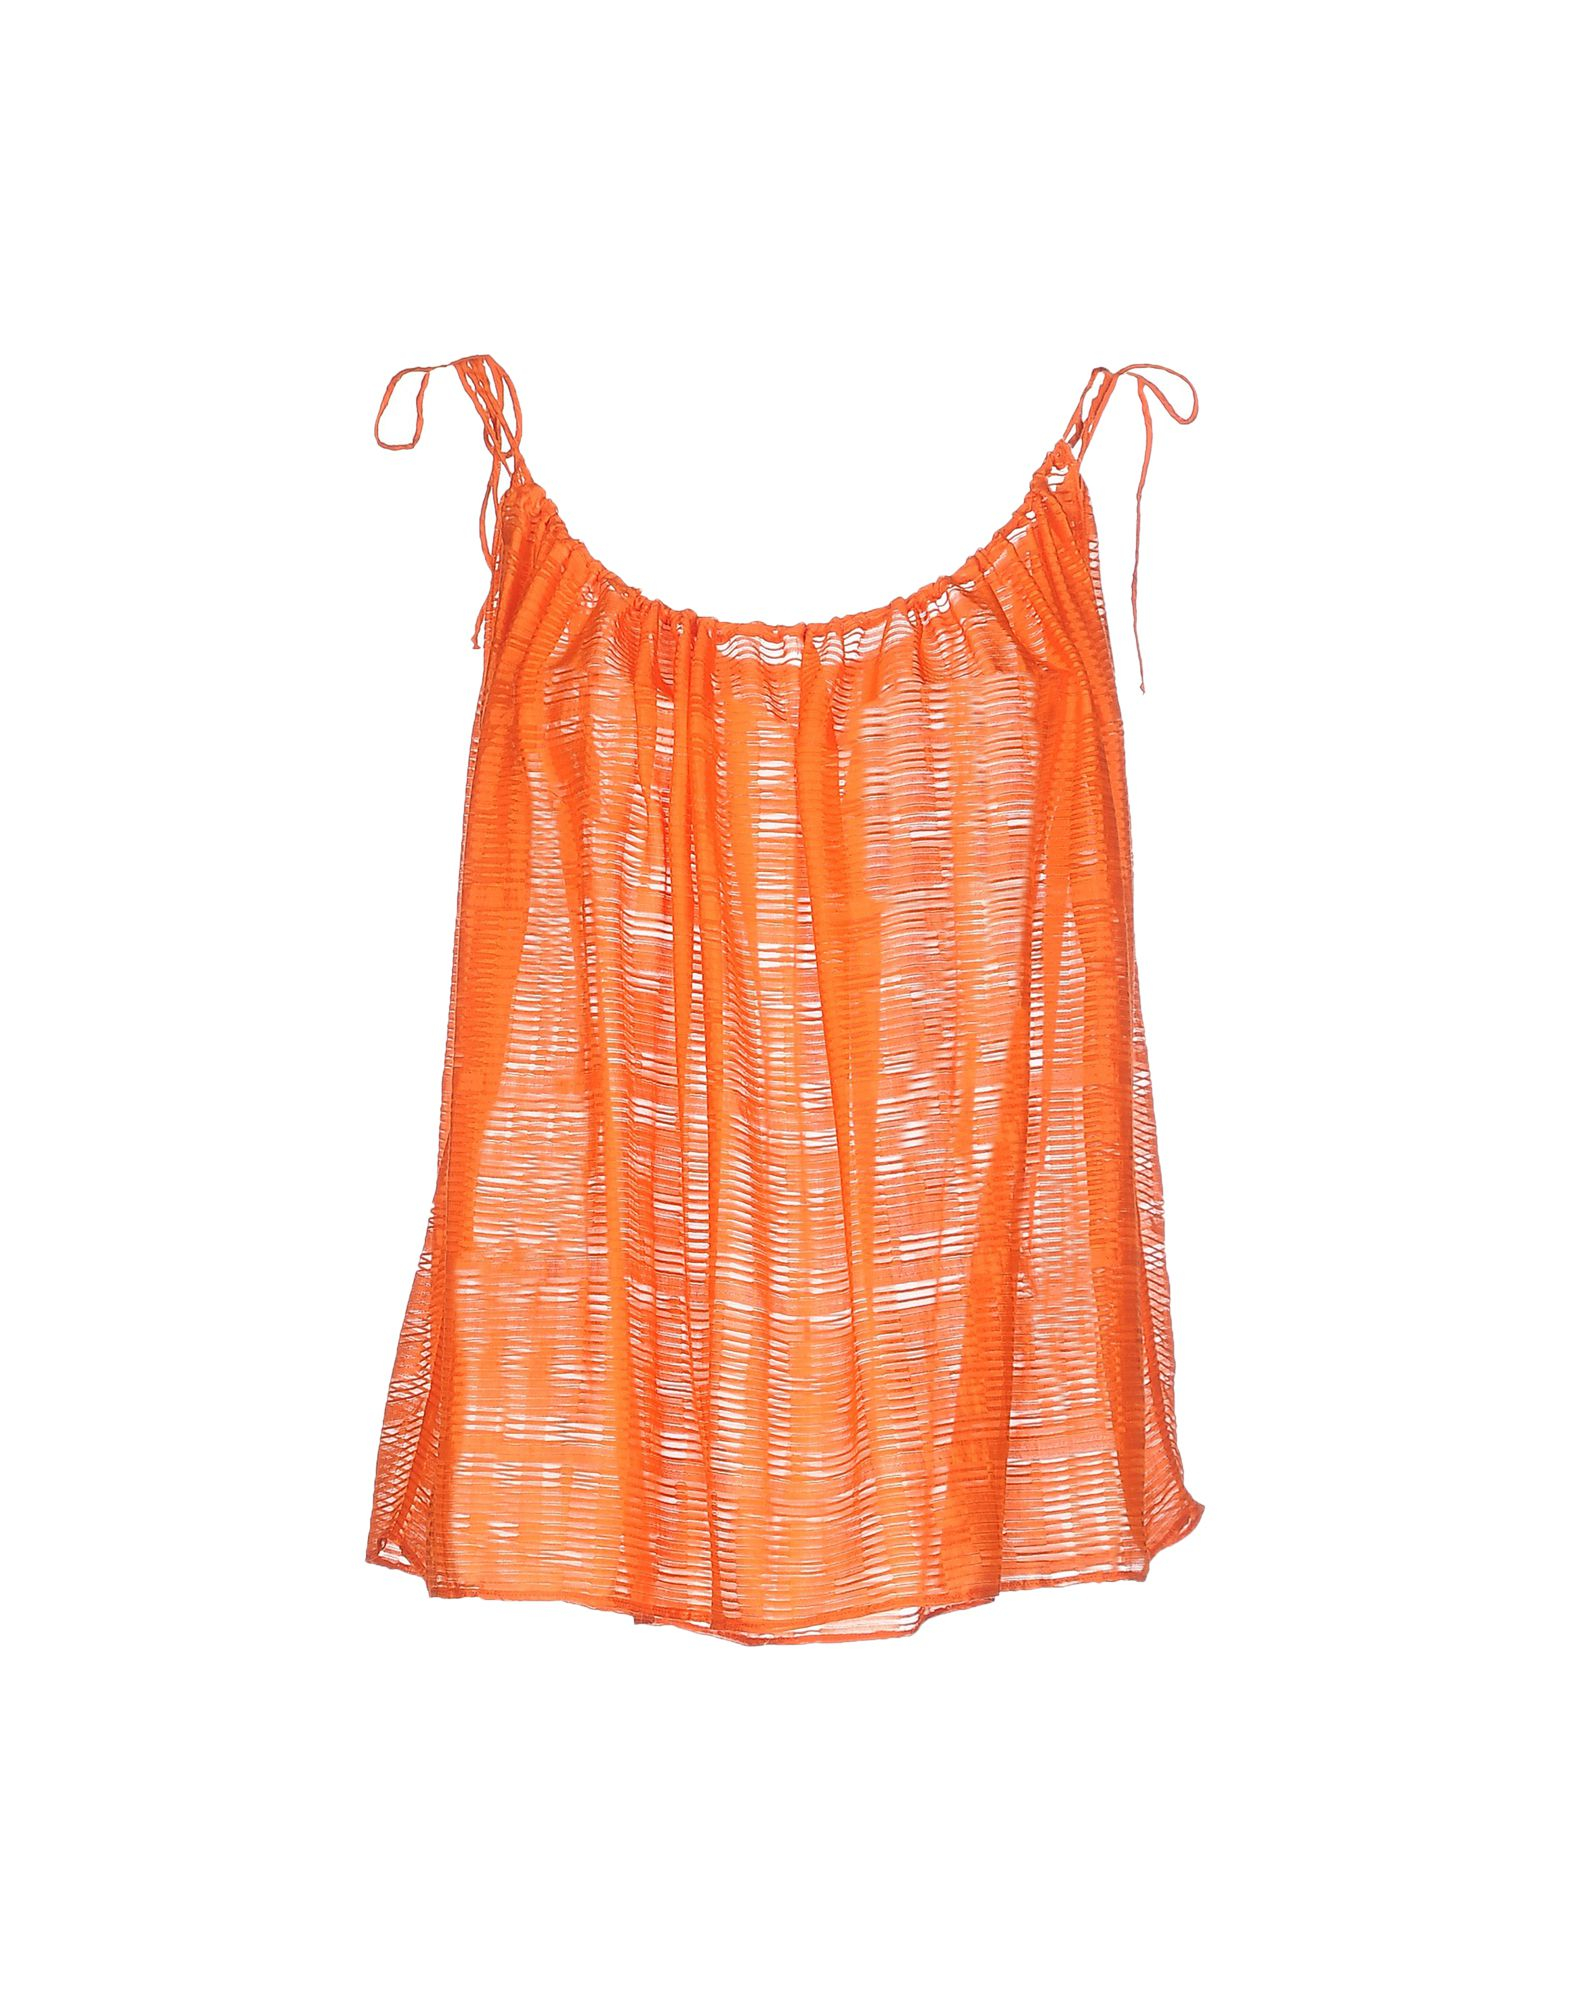 Orange Top With Umbrella Sleeves The Vanca: Fendi Top In Orange